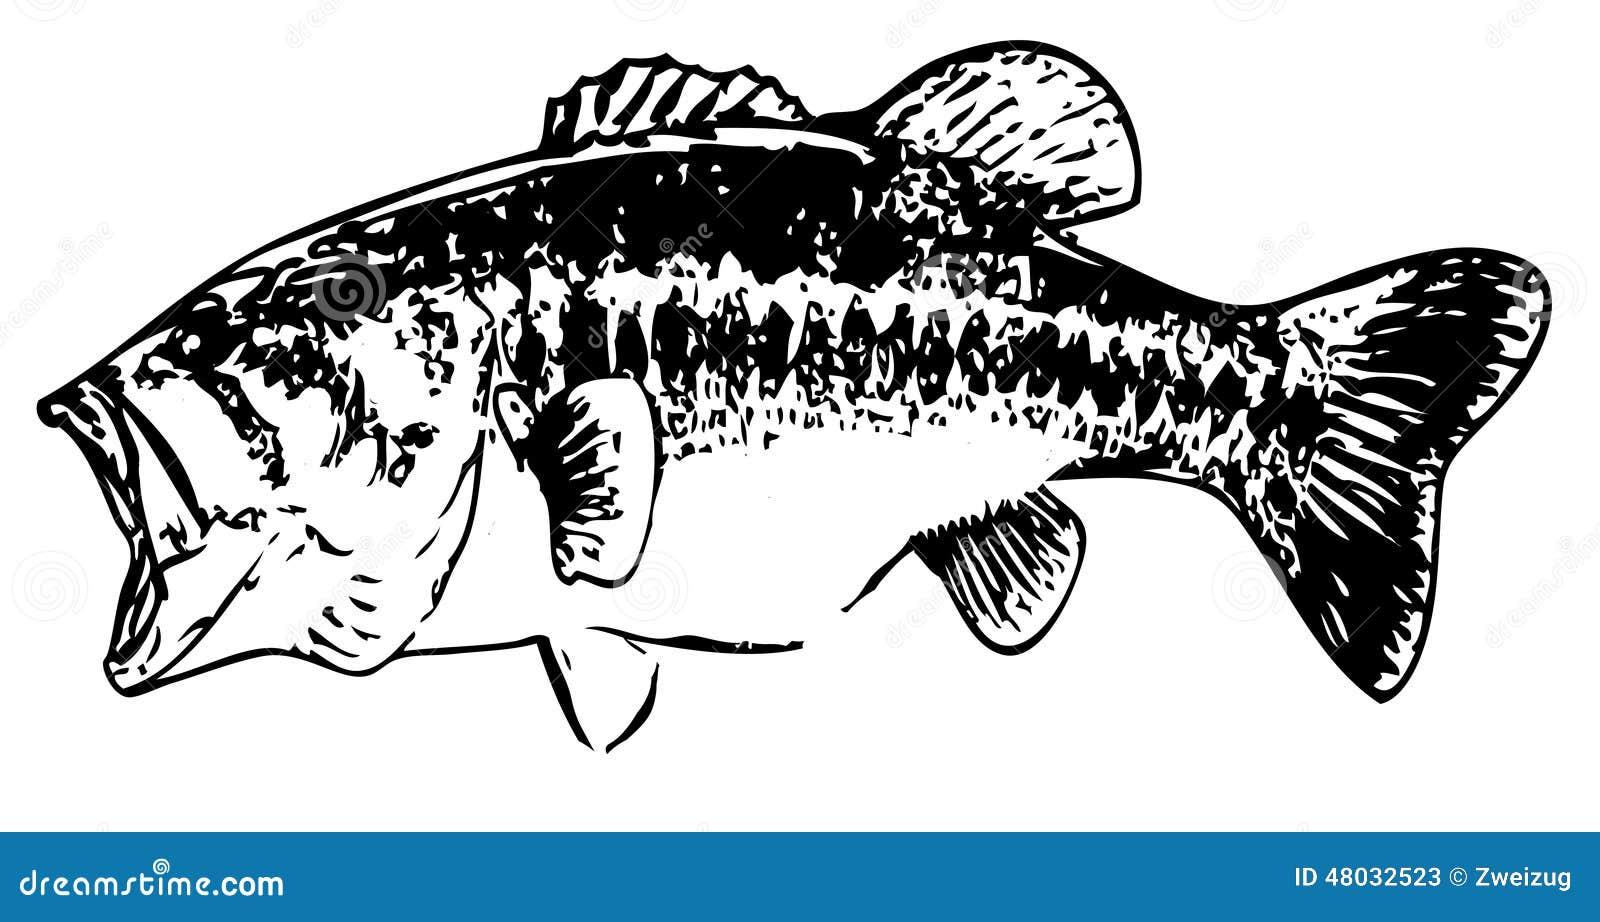 largemouth bass stock illustrations 260 largemouth bass stock rh dreamstime com Largemouth Bass Logo largemouth bass clip art free